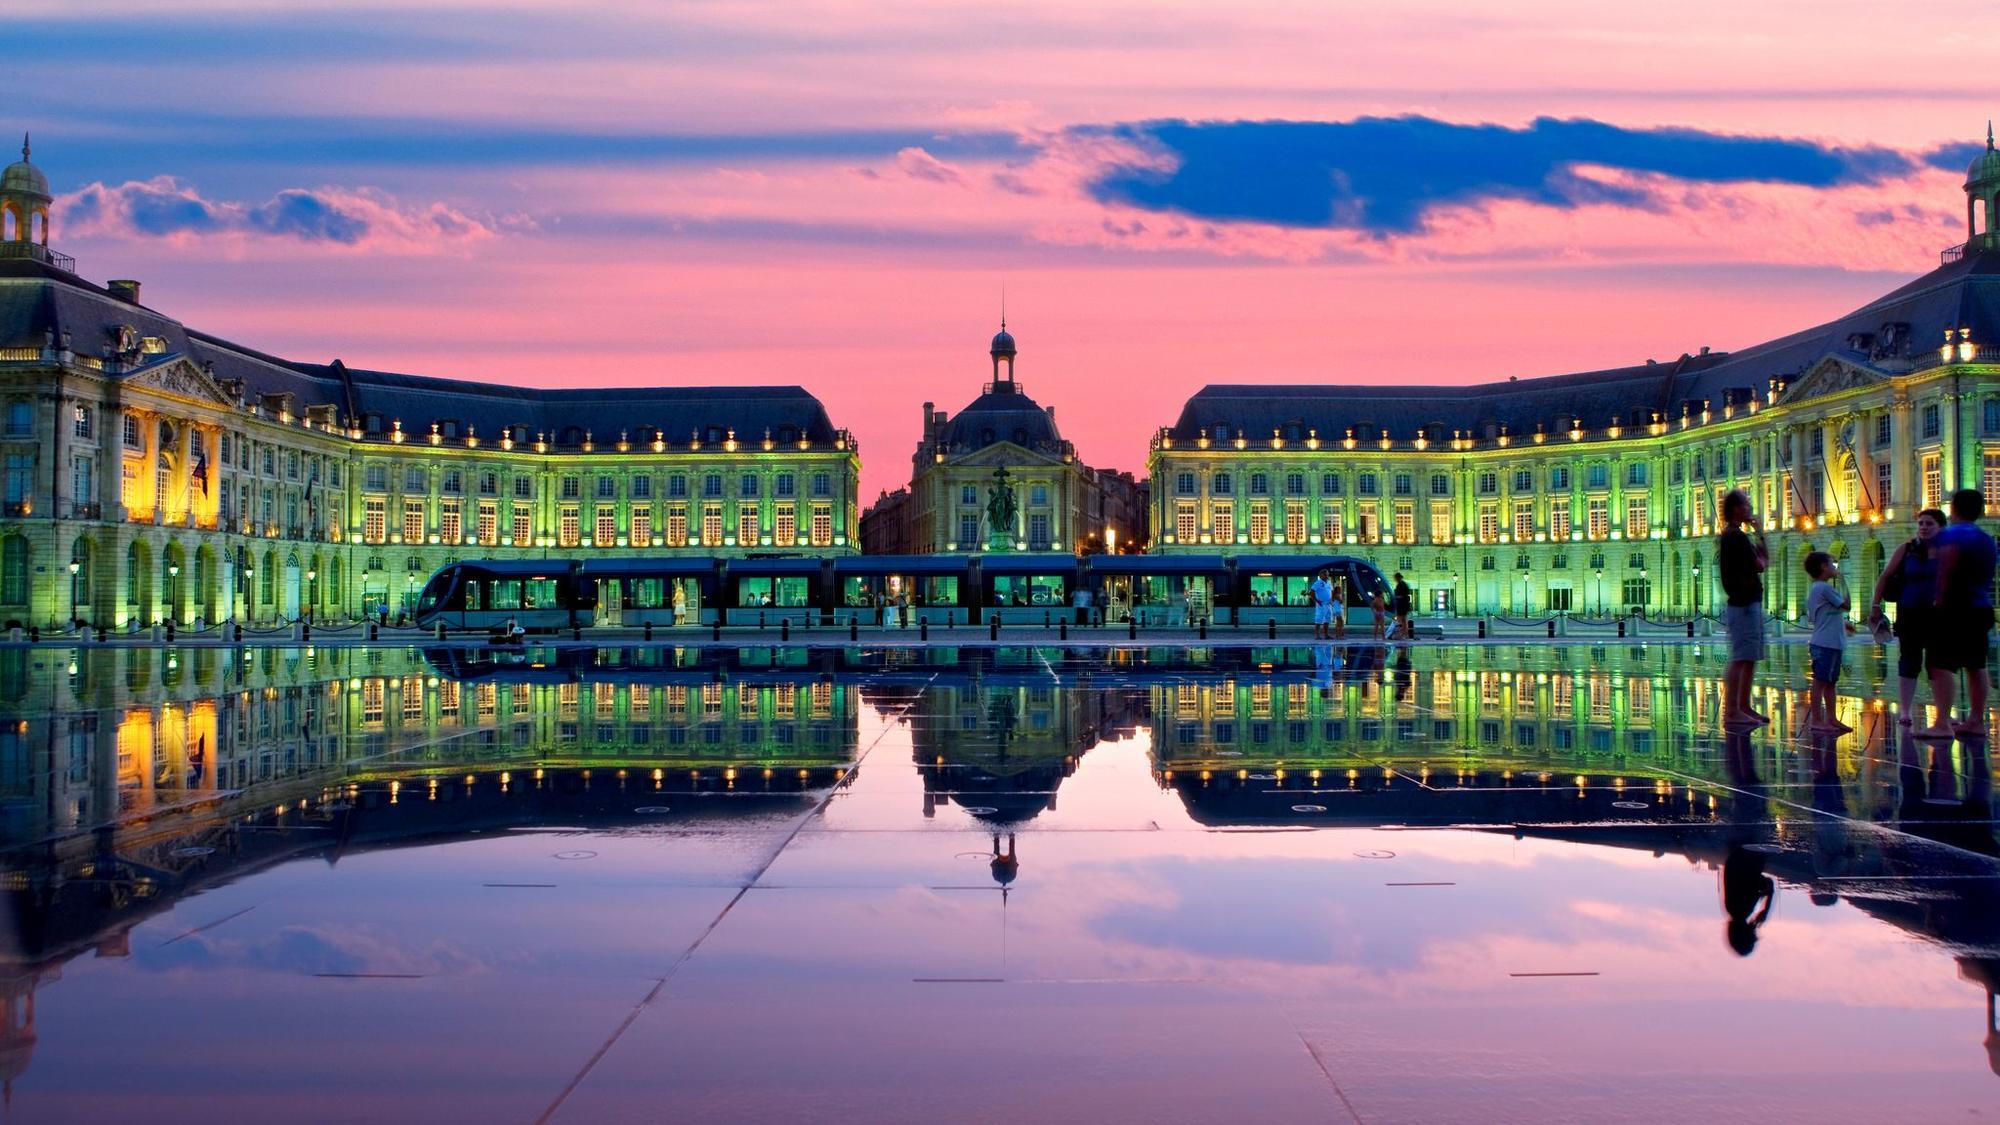 Ornamental water feature on  Place de la Bourse at dusk.